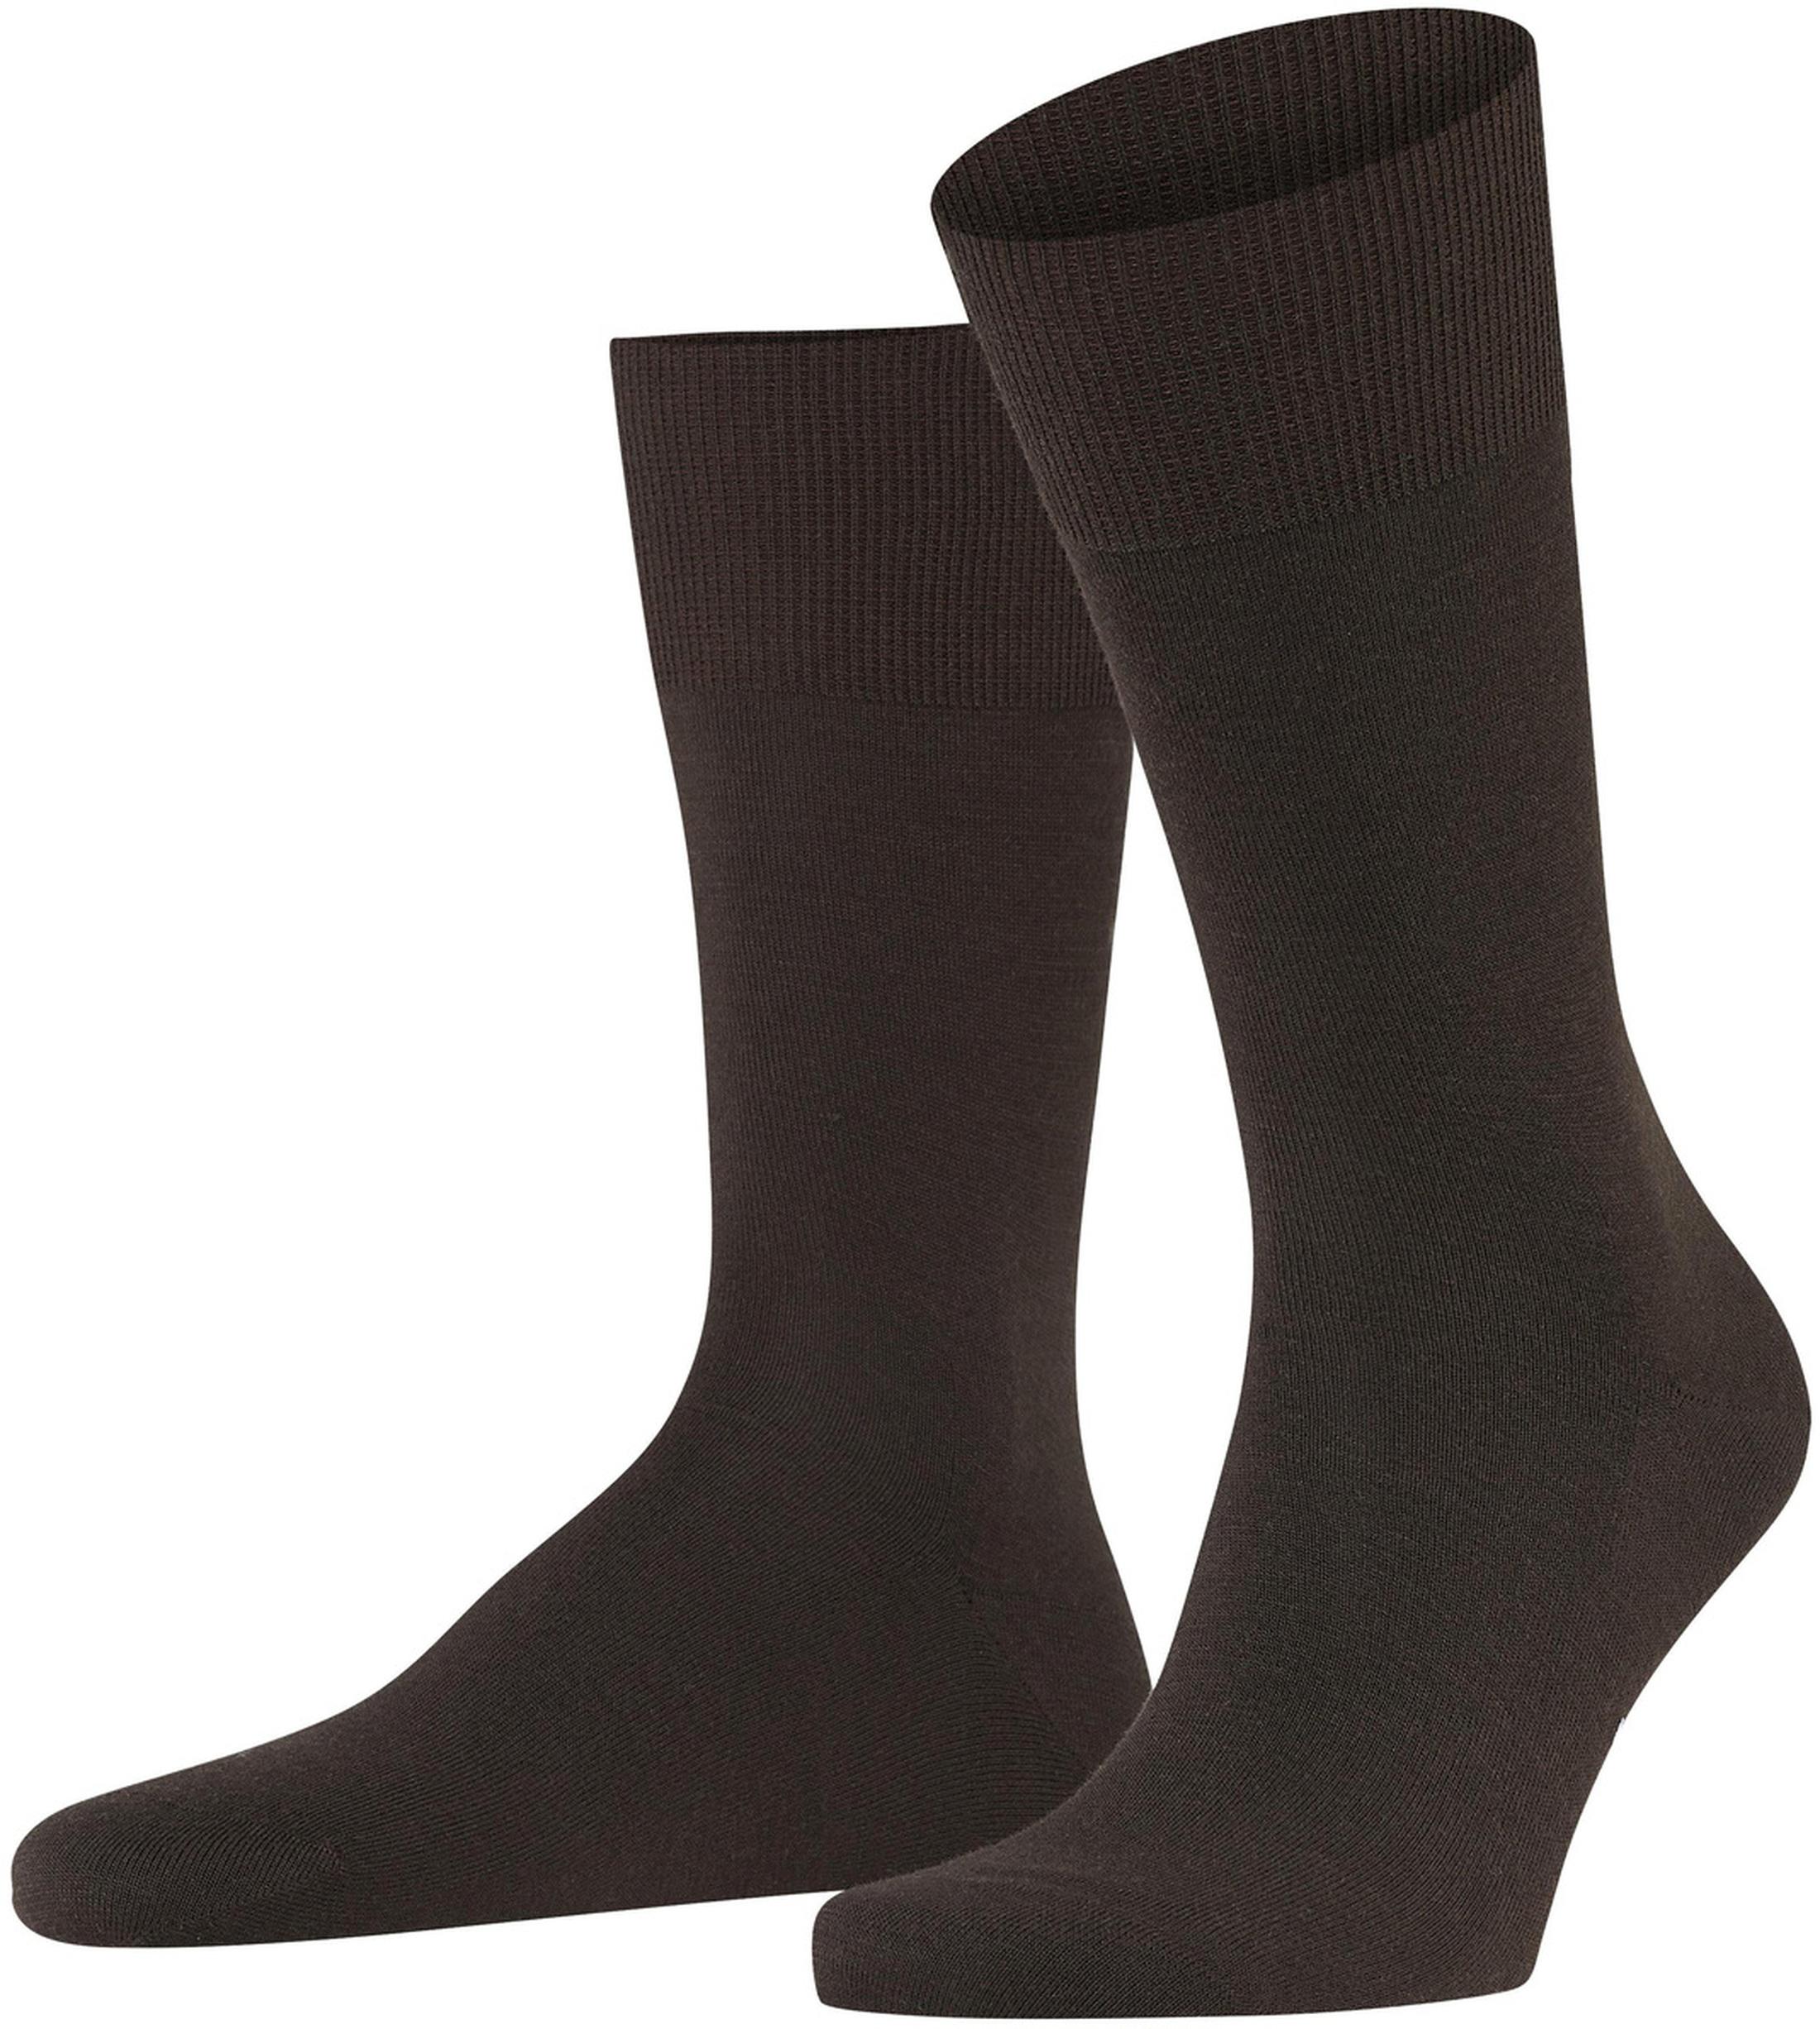 FALKE Airport Socken Braun 5930